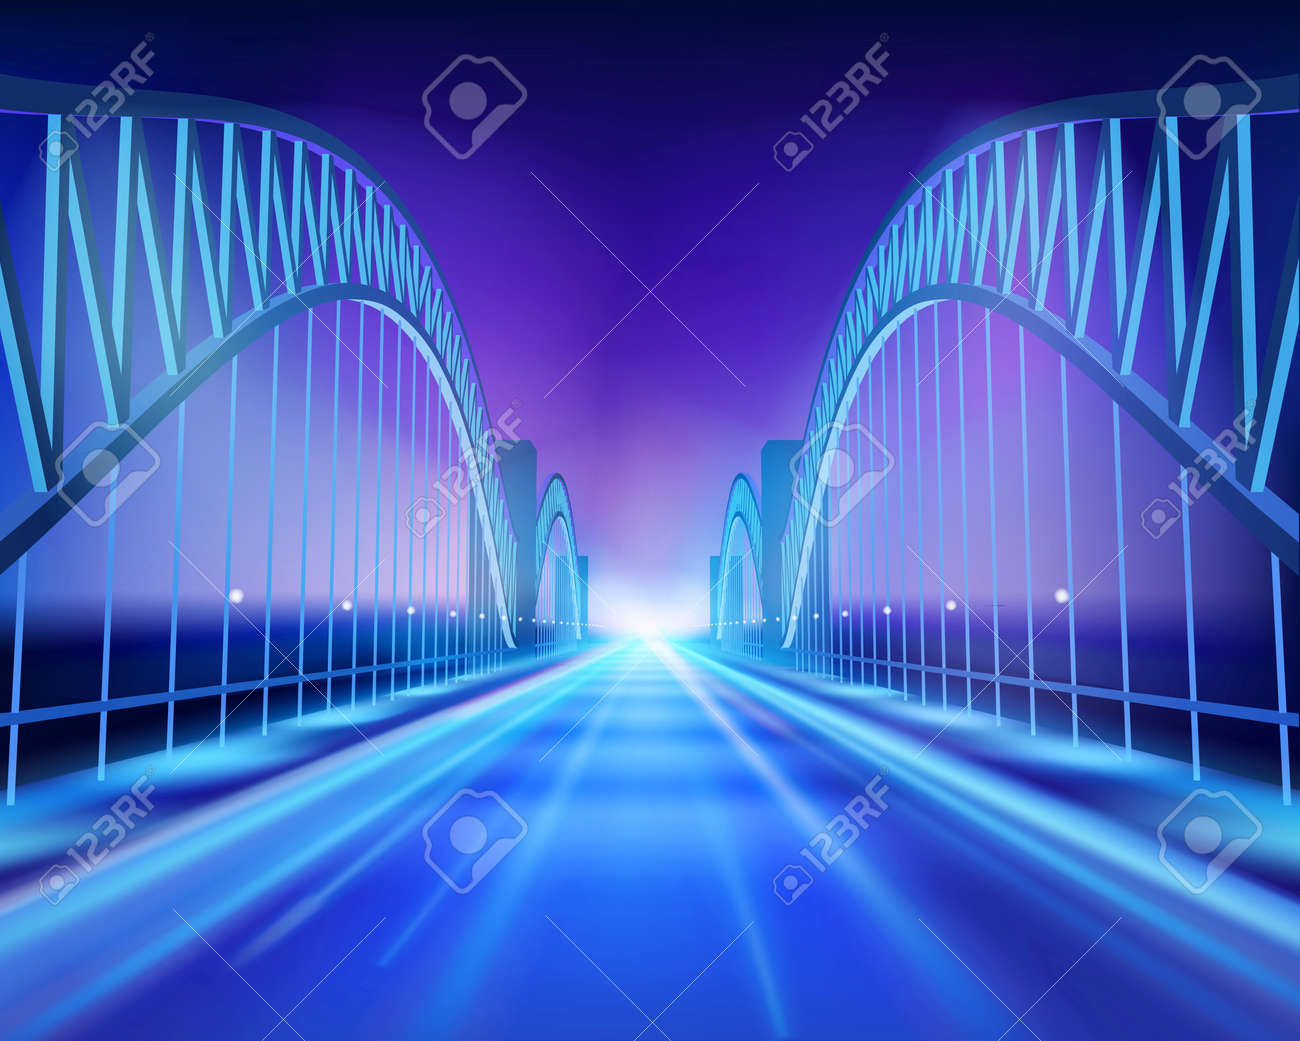 Bridge in the night. Vector Illustration. - 38938869